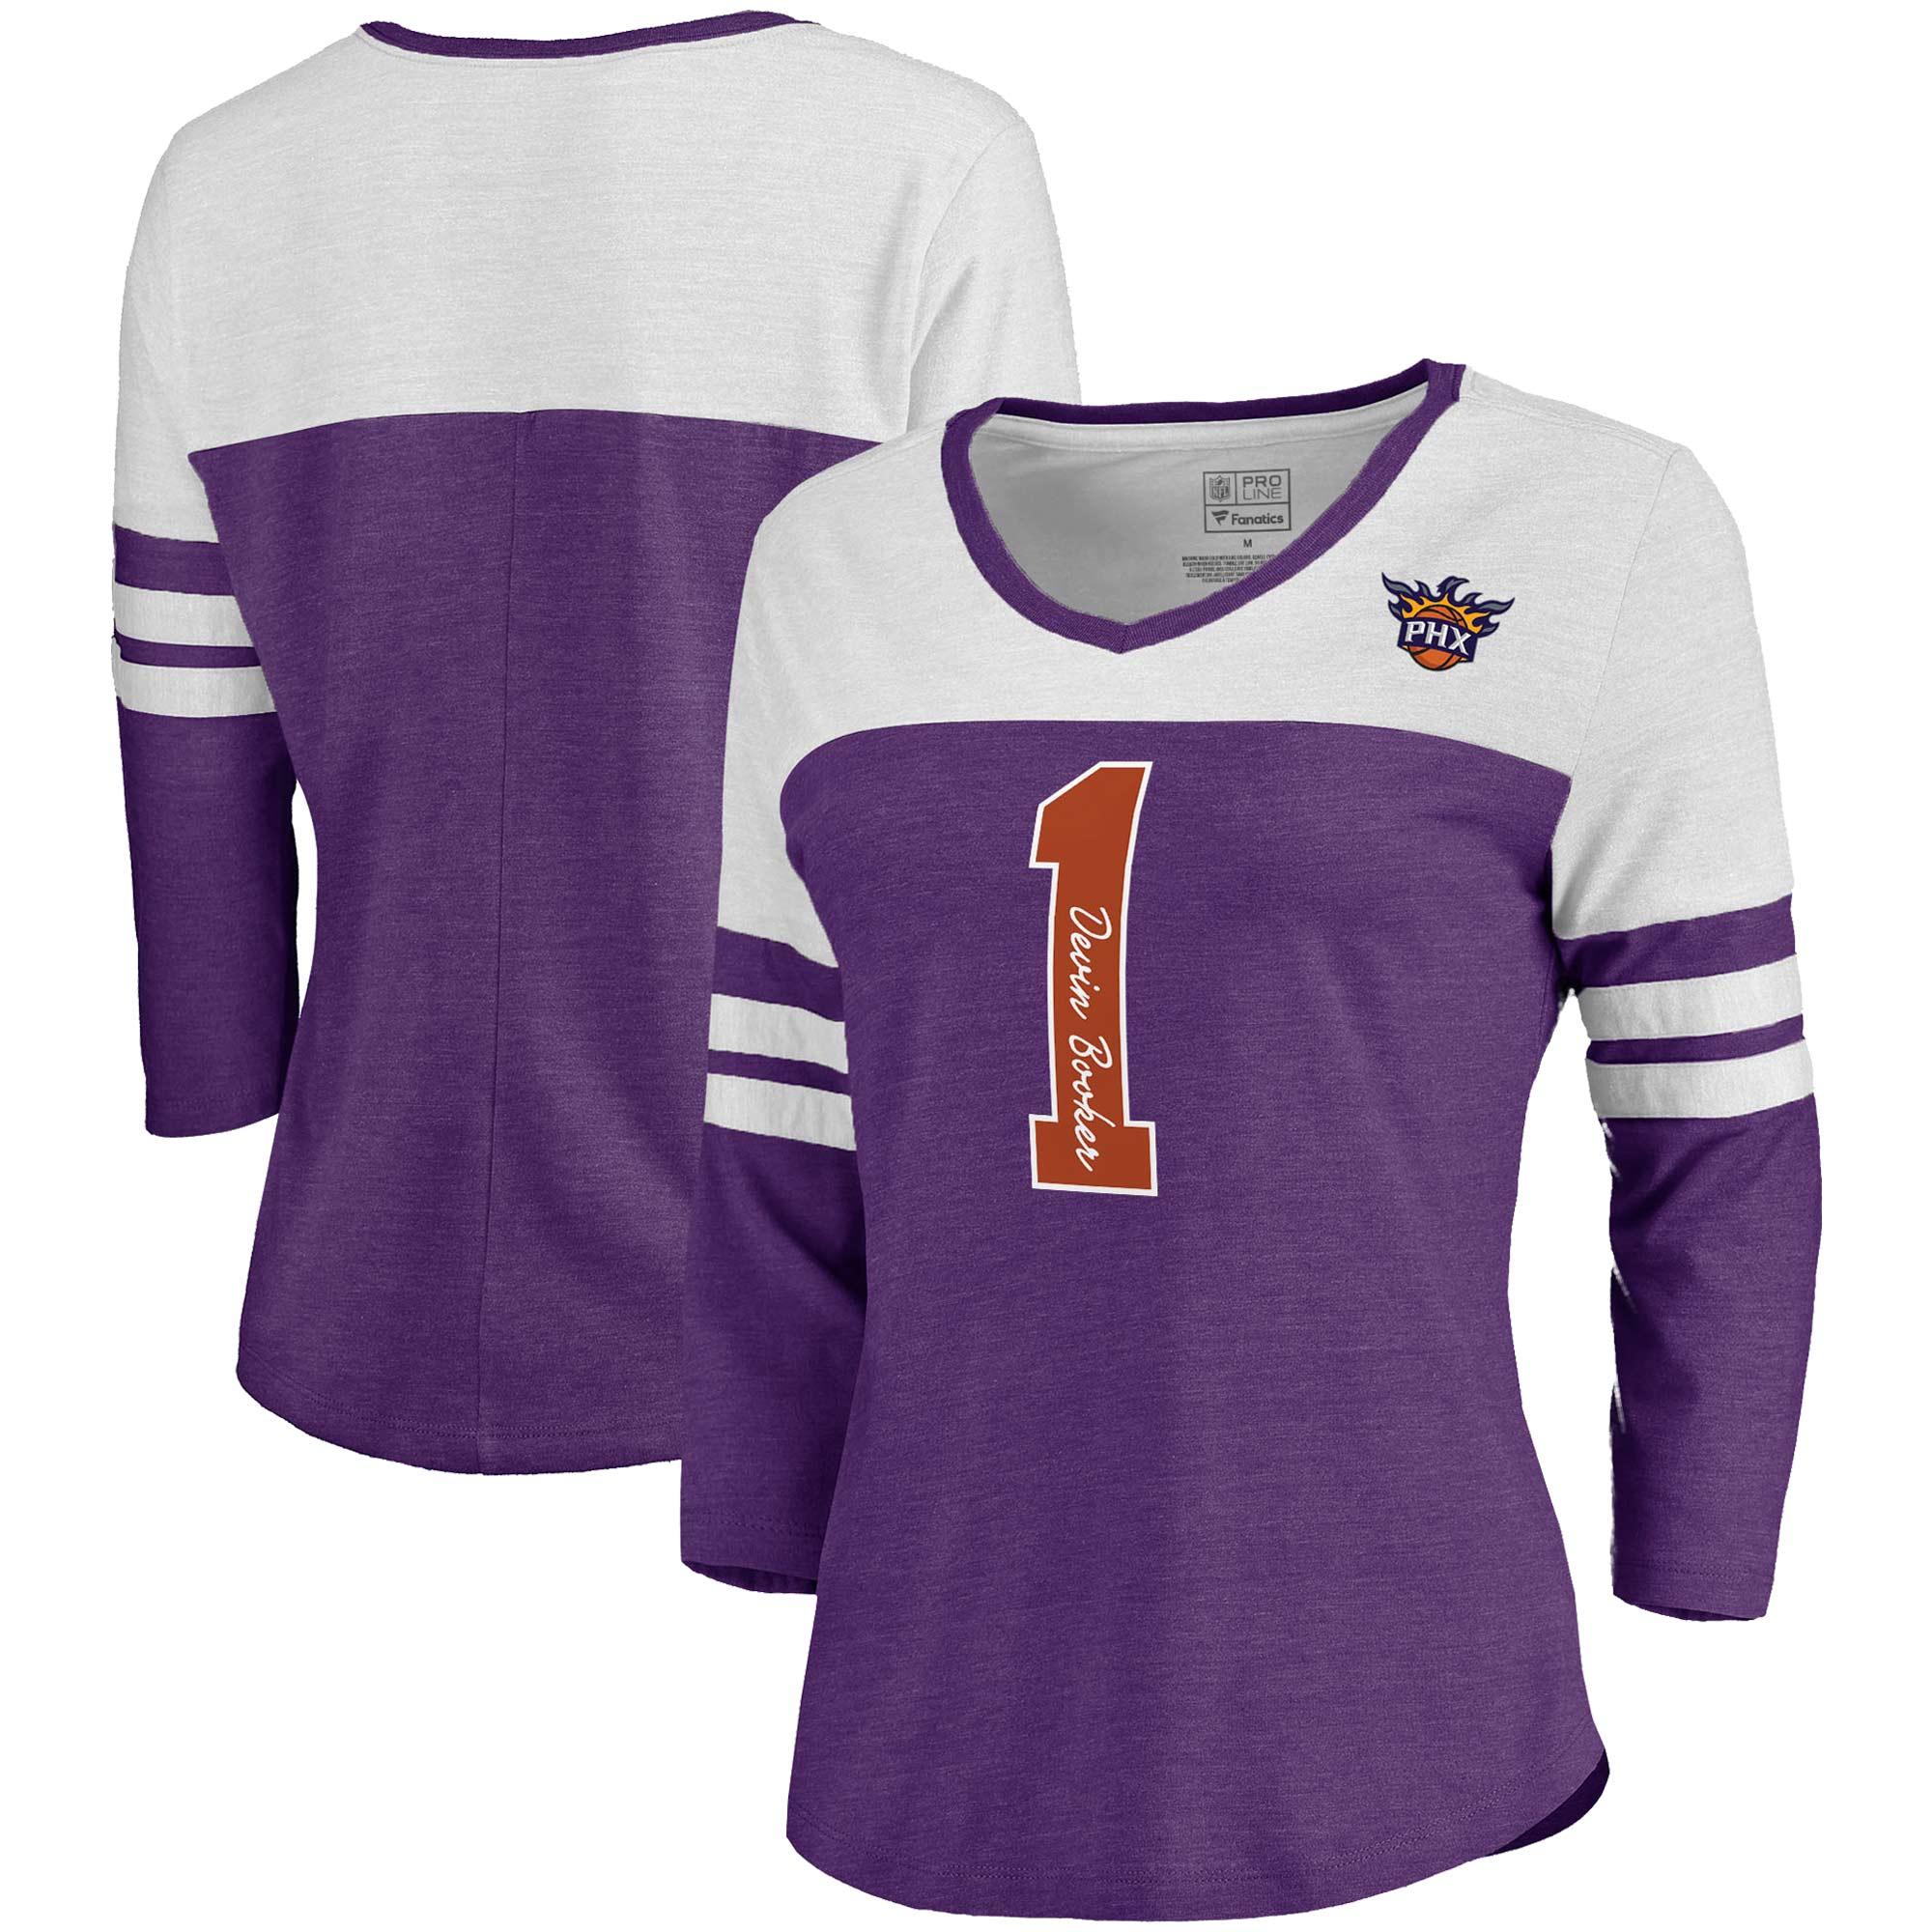 Devin Booker Phoenix Suns Fanatics Branded Women's Starstruck Name & Number Tri-Blend 3/4-Sleeve V-Neck T-Shirt - Purple